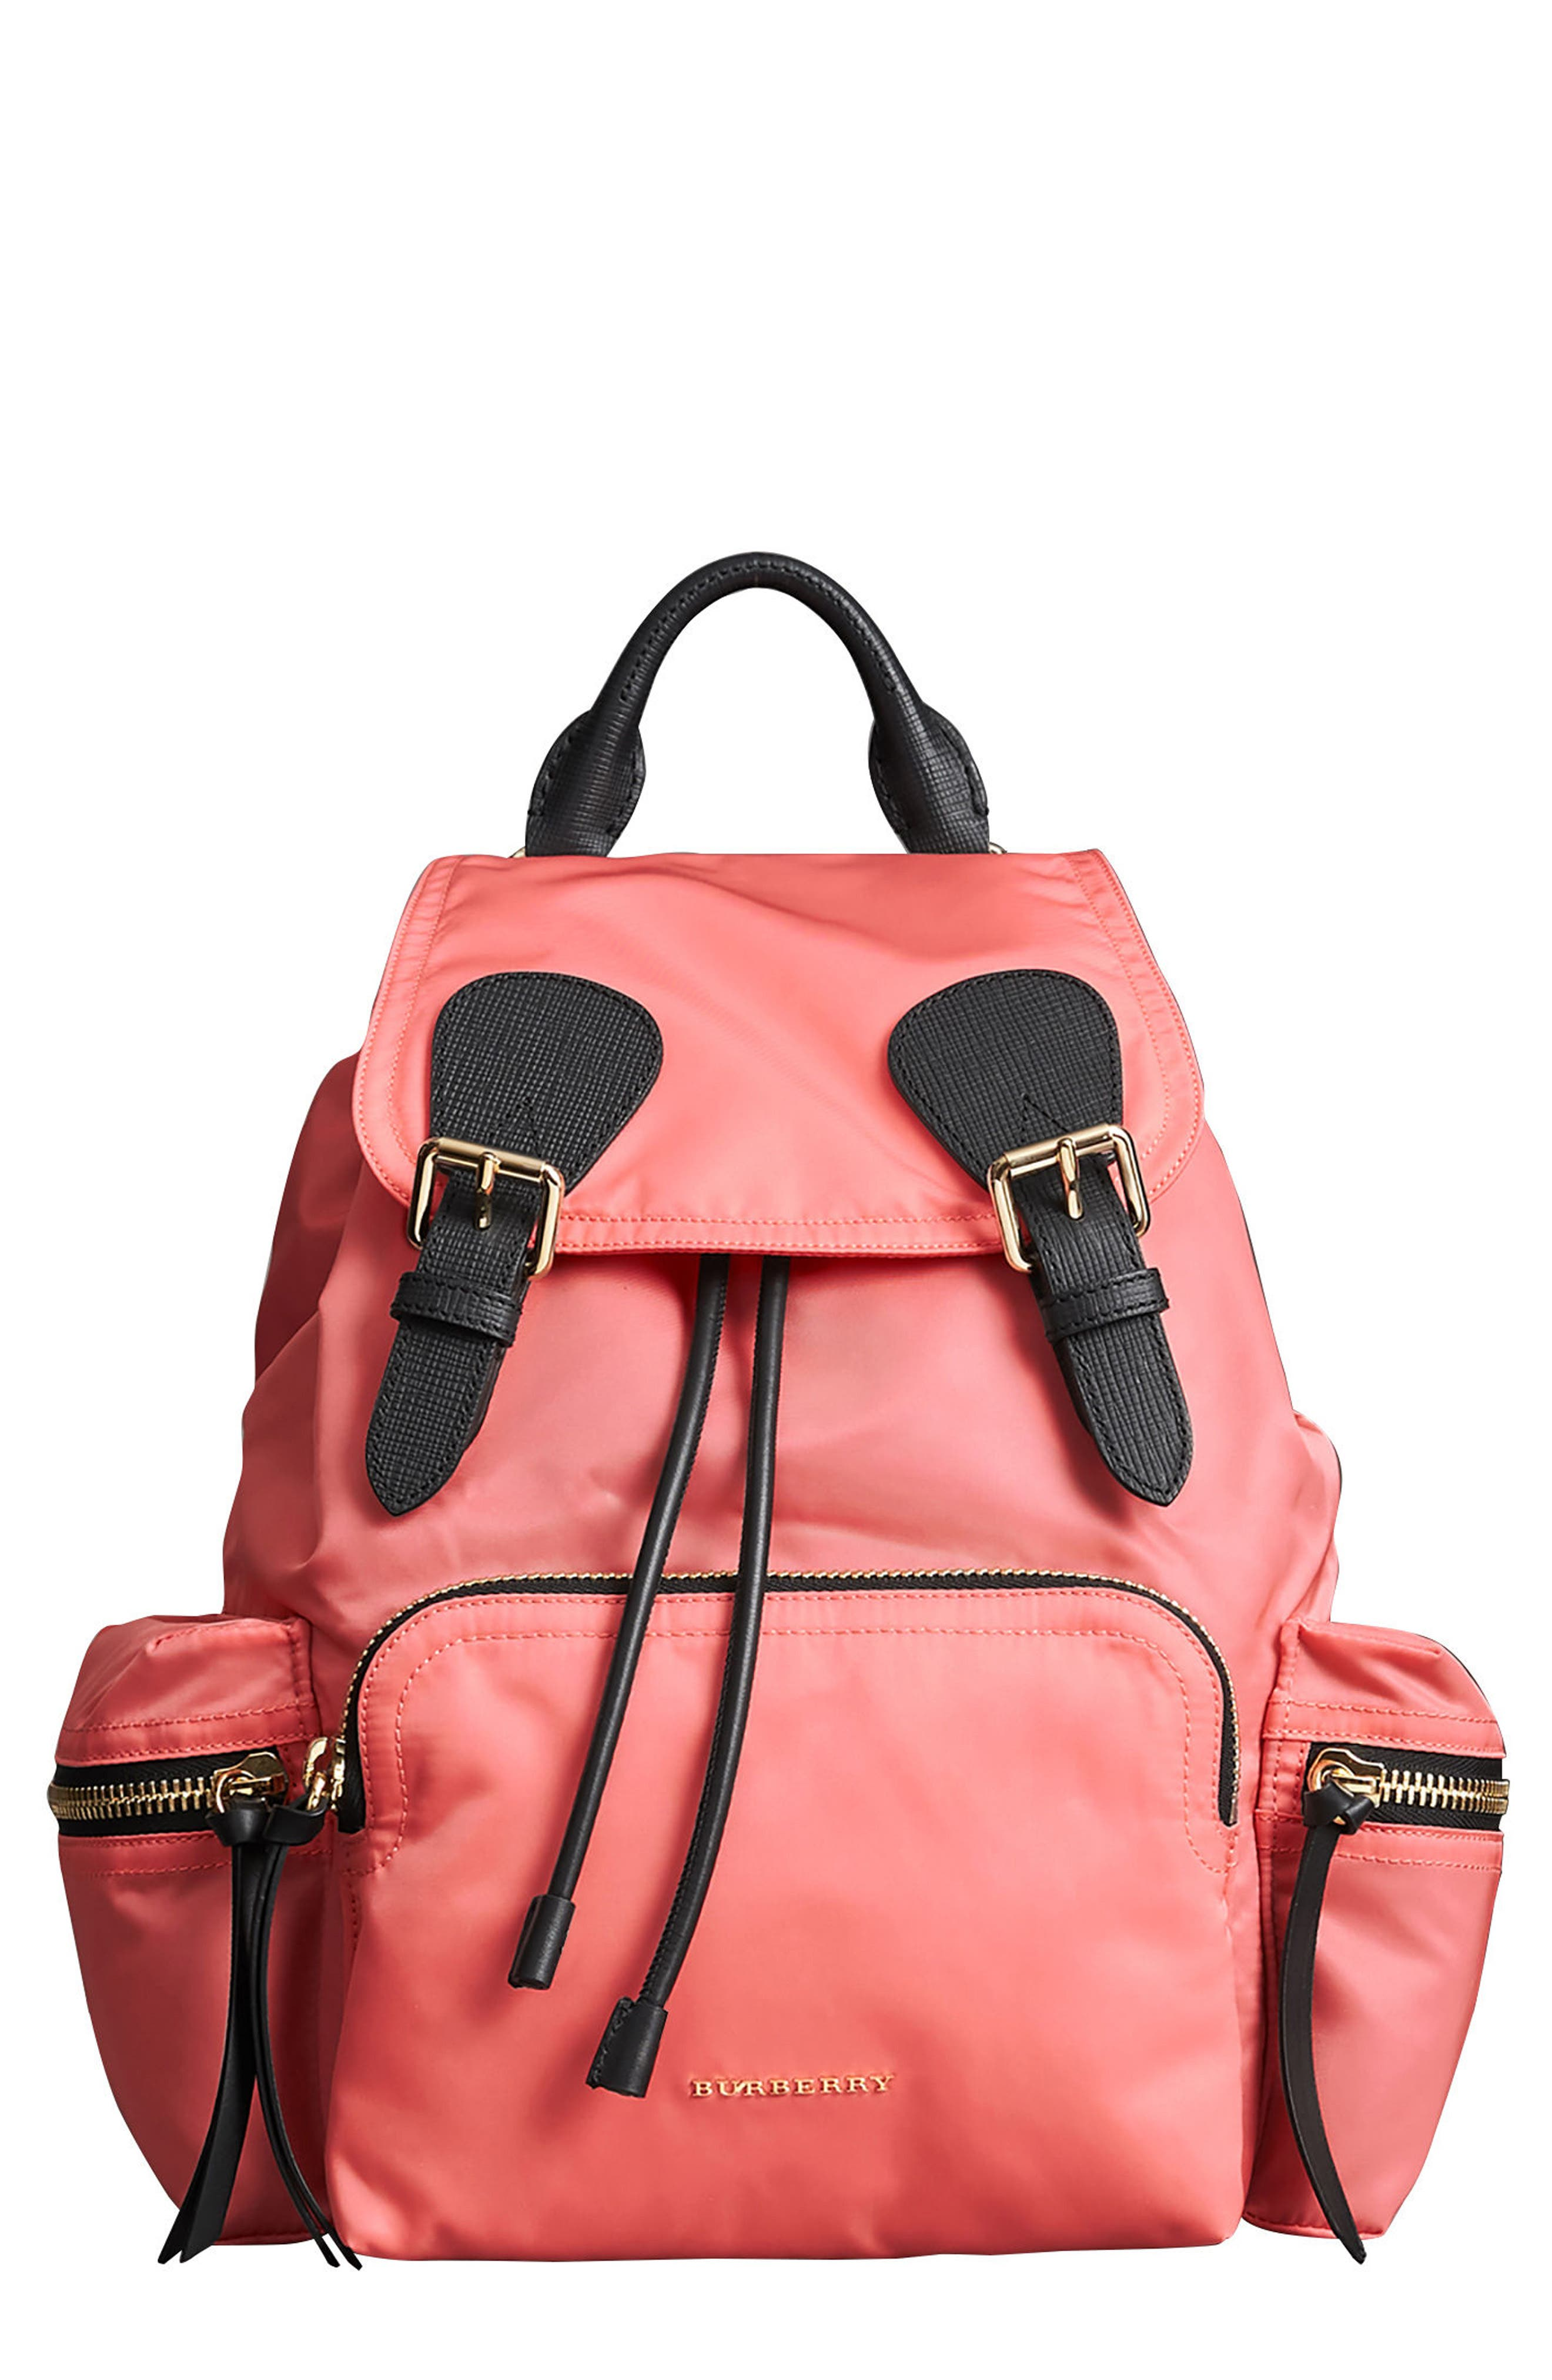 Medium Rucksack Nylon Backpack,                         Main,                         color, 950